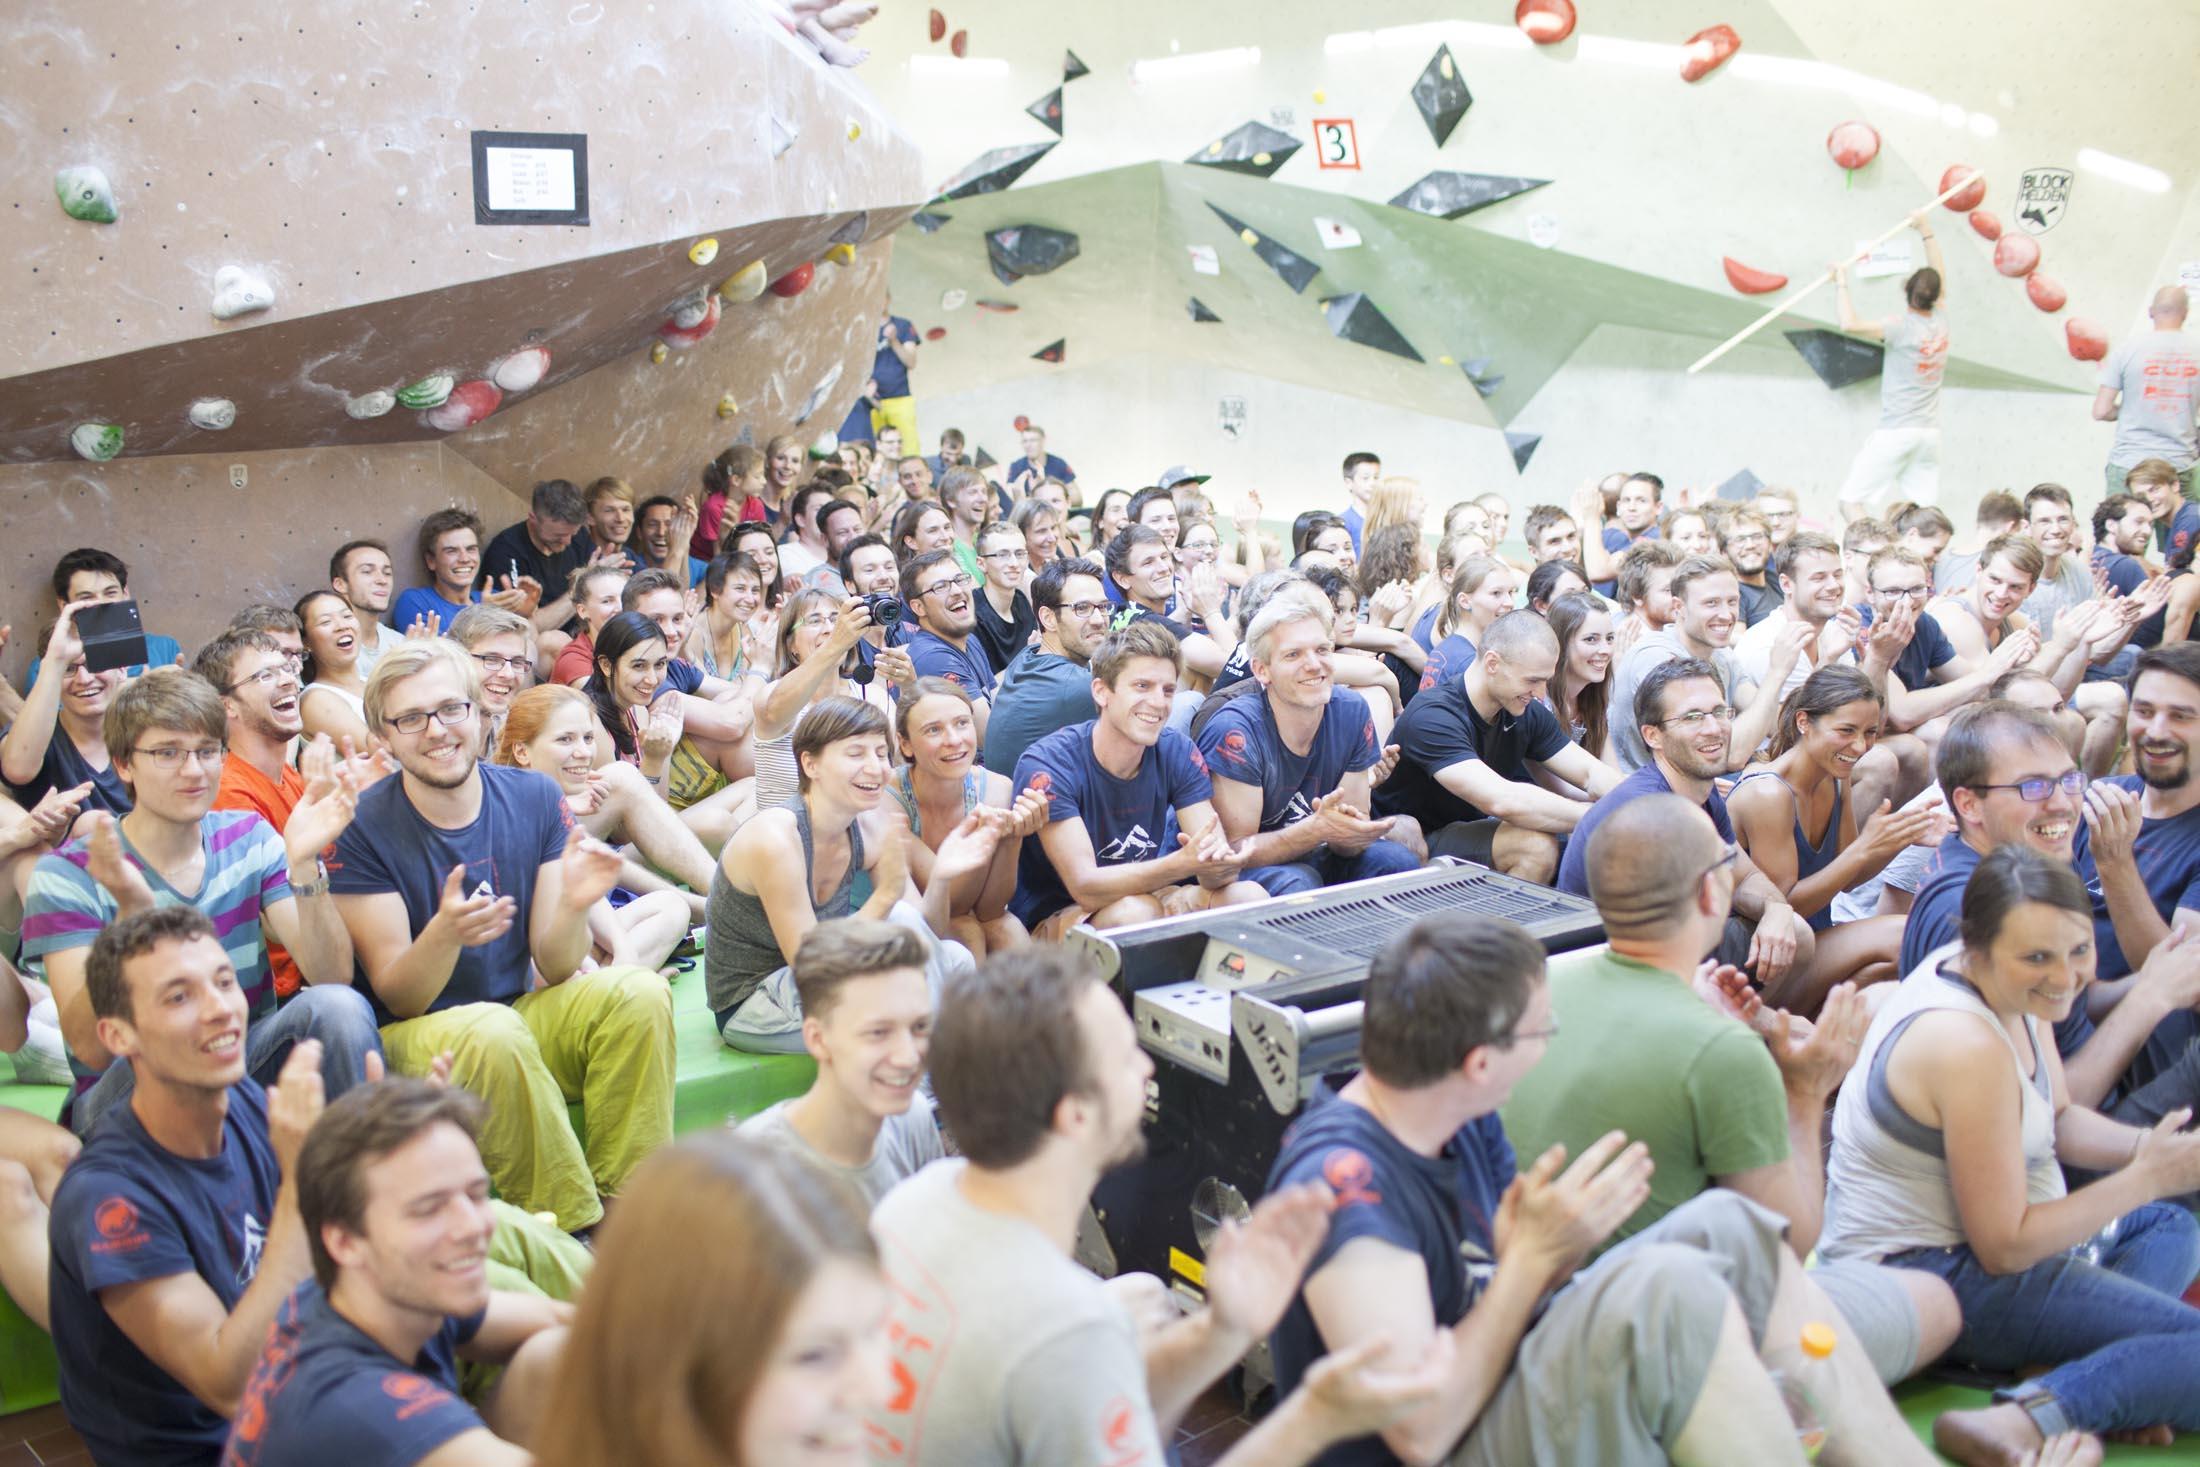 Finale, internationaler bouldercup Frankenjura 2016, BLOCKHELDEN Erlangen, Mammut, Bergfreunde.de, Boulderwettkampf07092016592